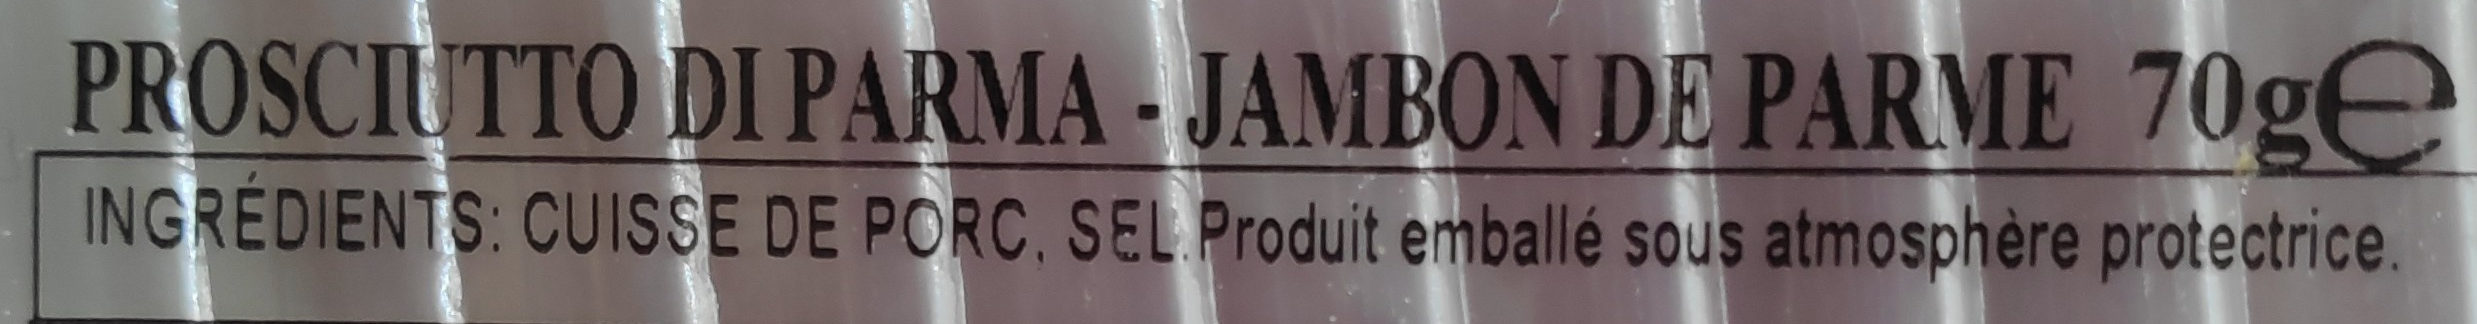 Jambon de parme Citterio - Ingrediënten